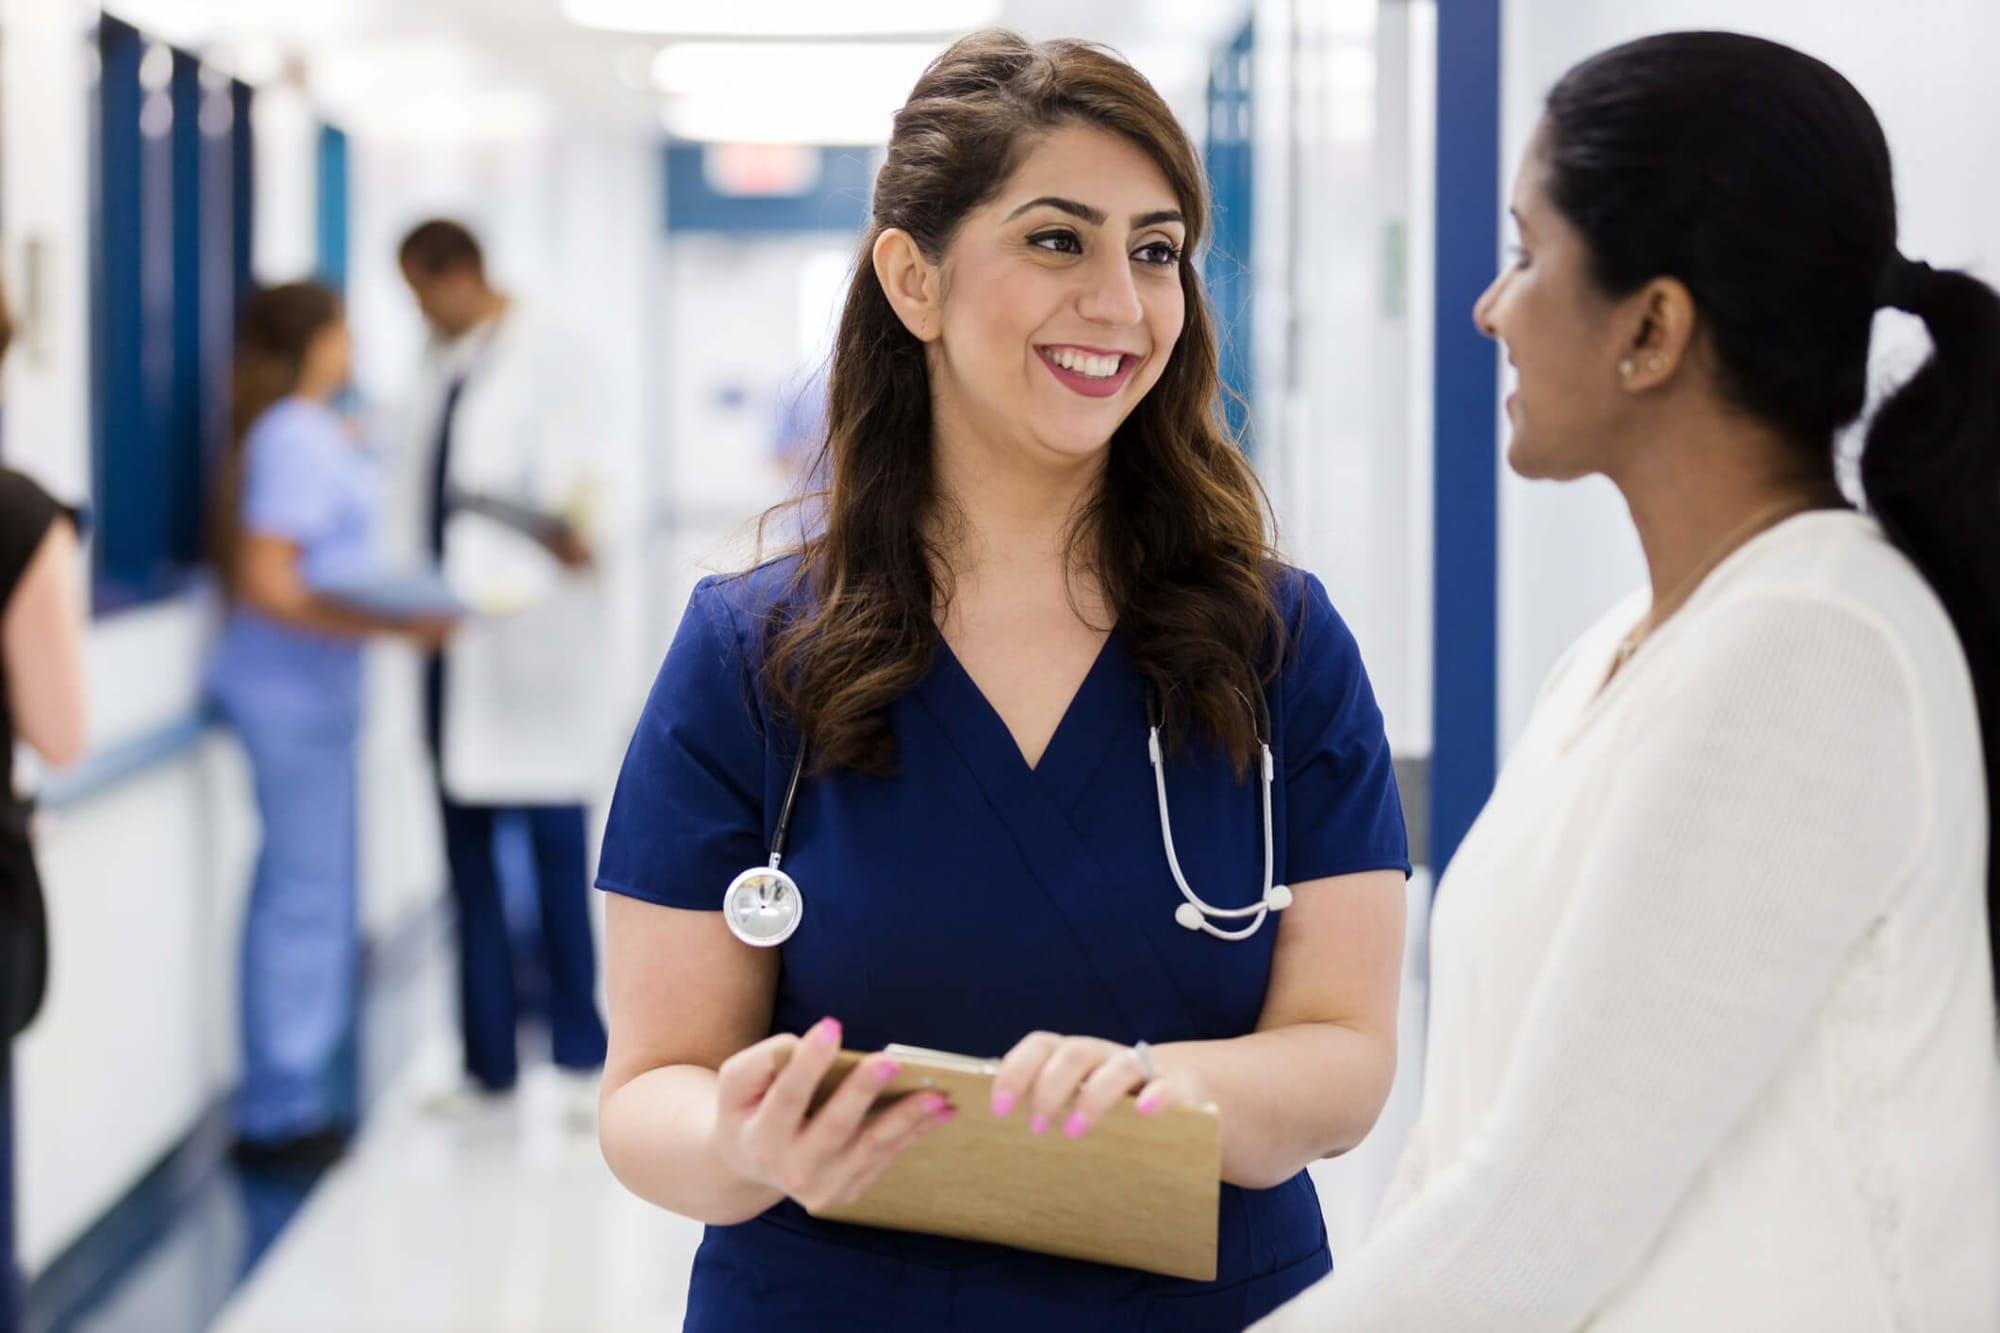 Ambulatory Care Nurse Career Overview